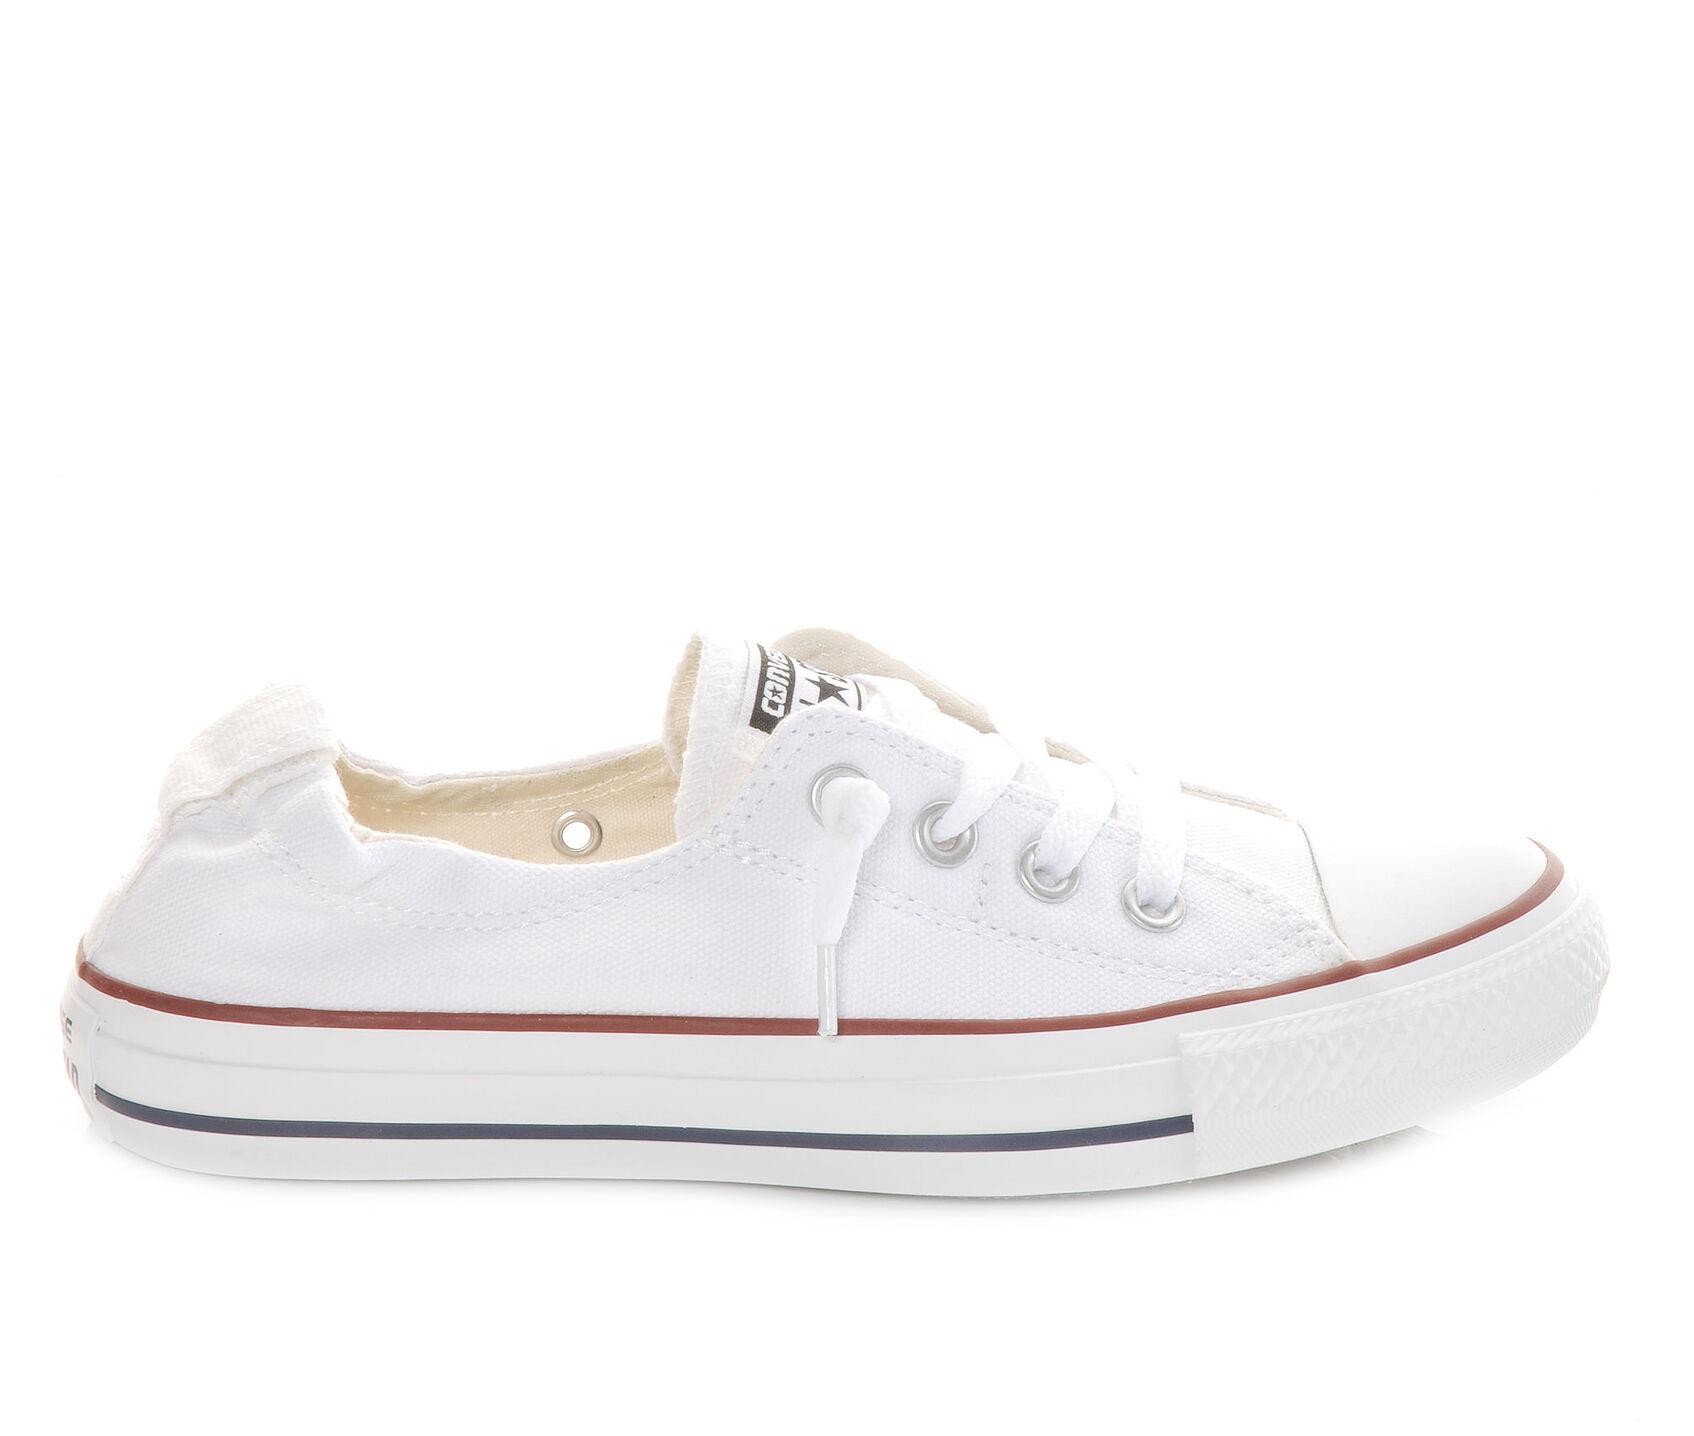 Womens converse chuck taylor shoreline sneakers nvjuhfo Choice Image